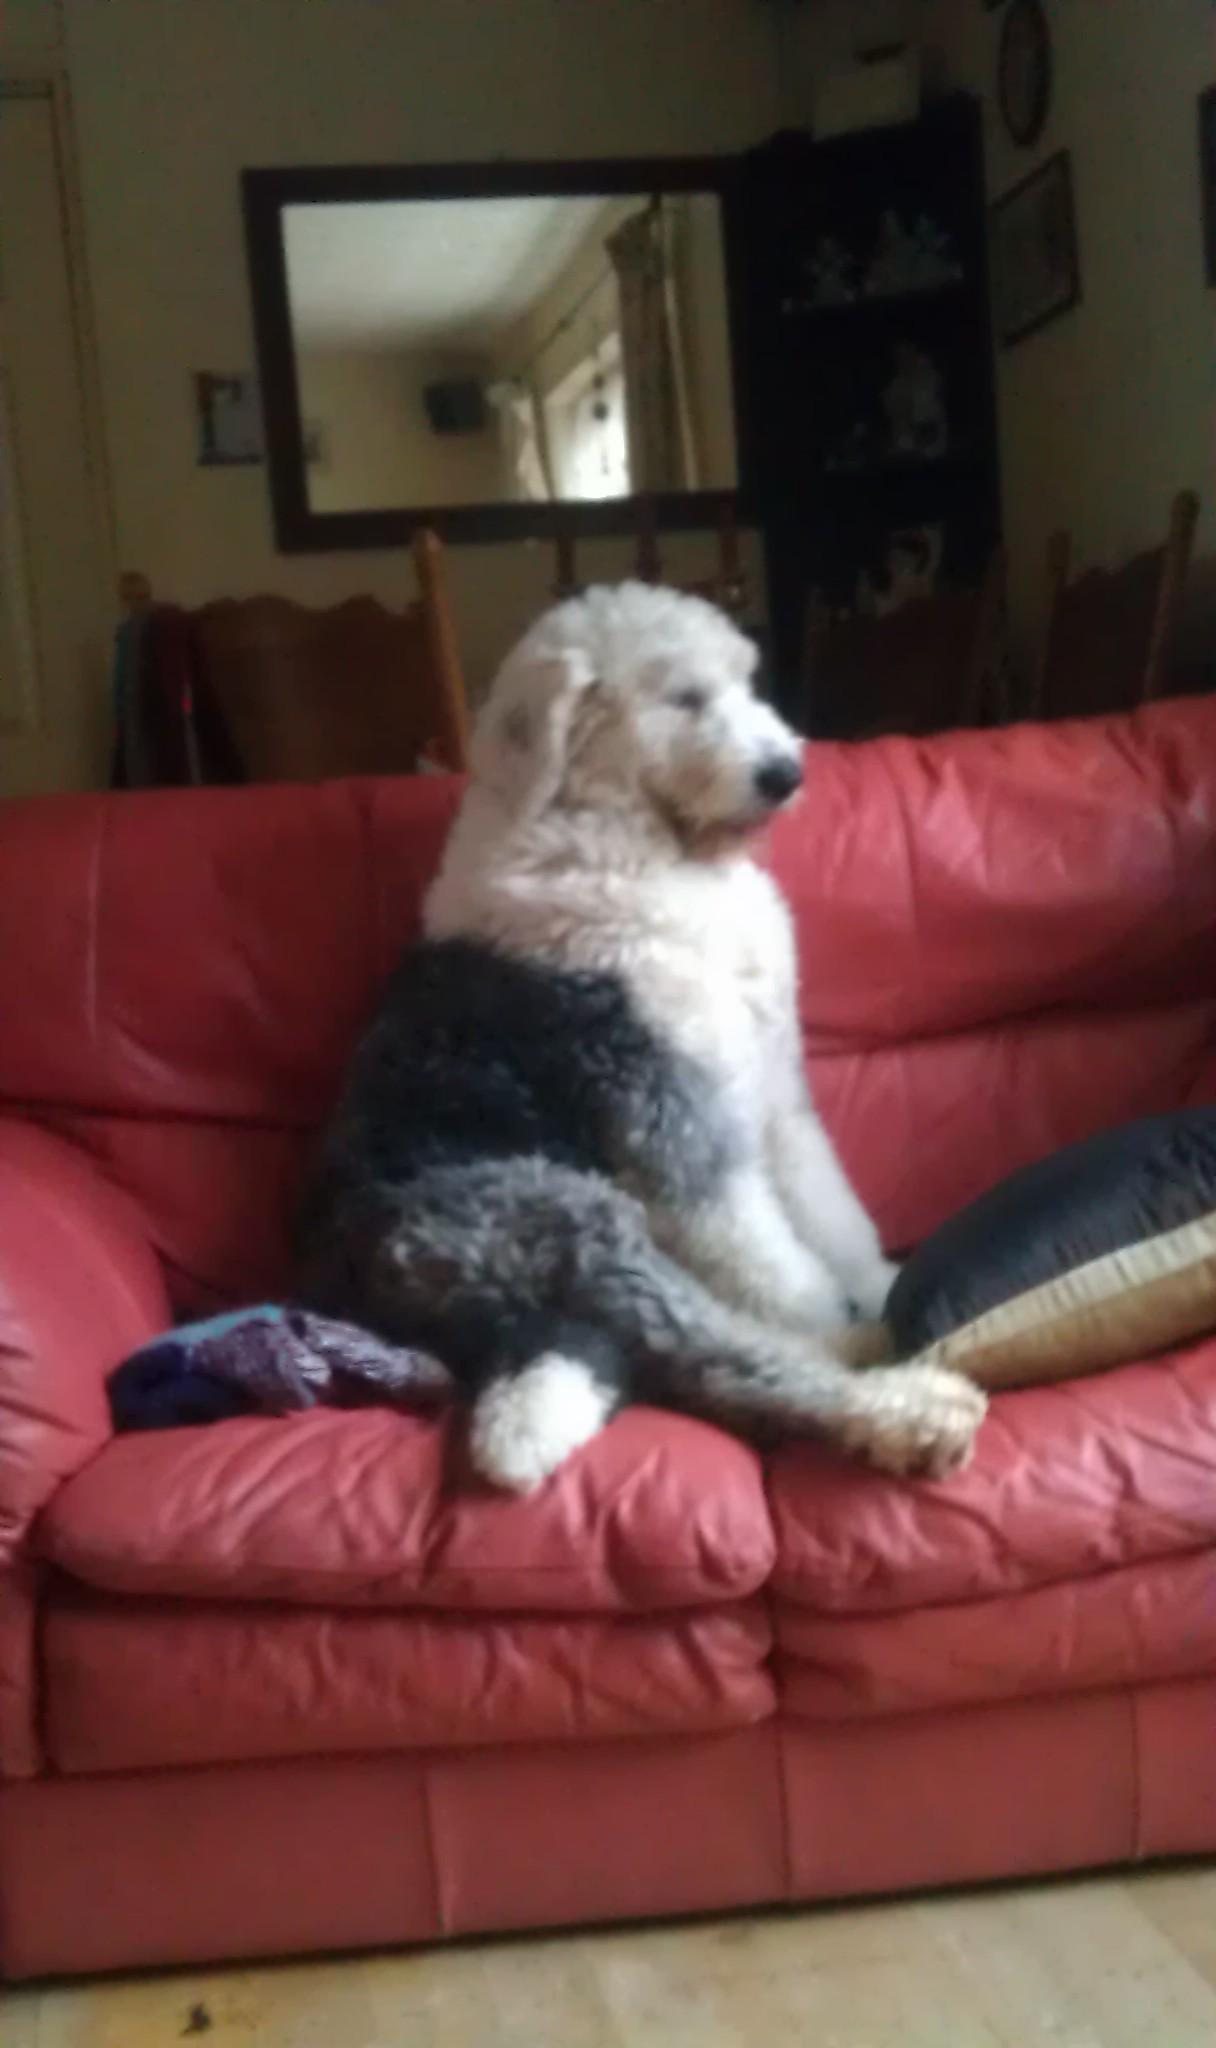 Year Old Dog Leaking Urine